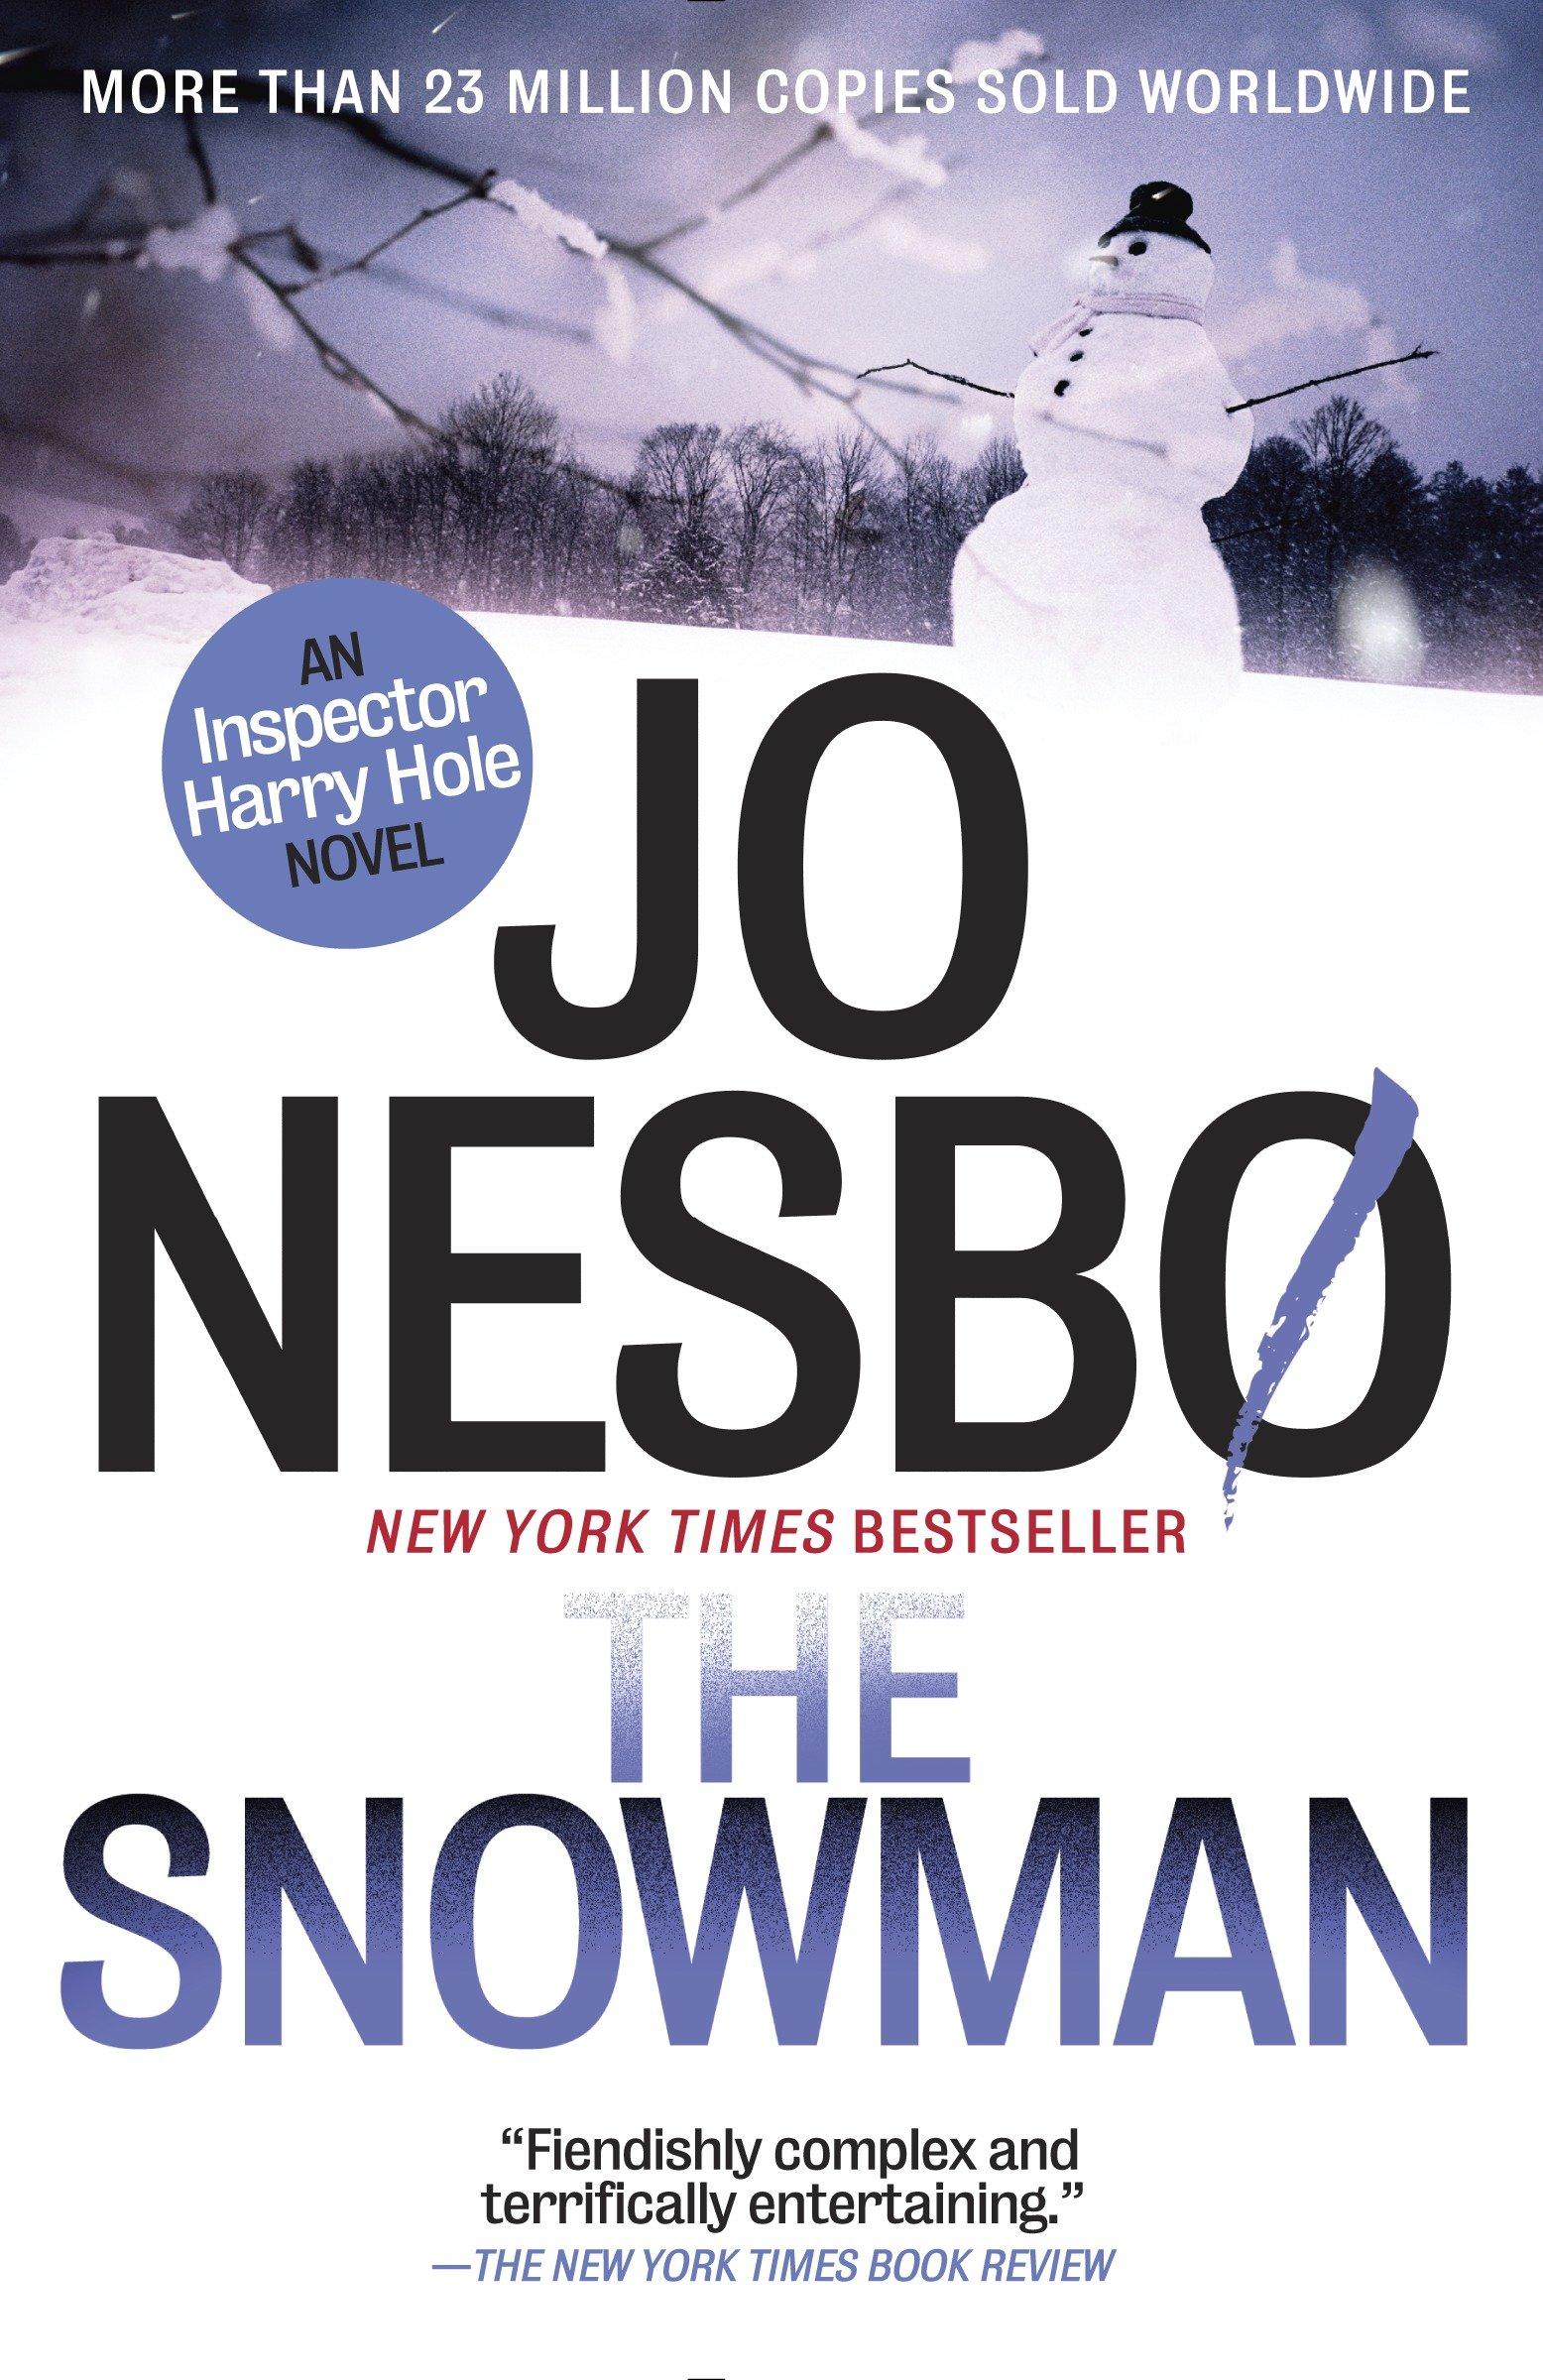 The Snowman a Harry Hole novel cover image